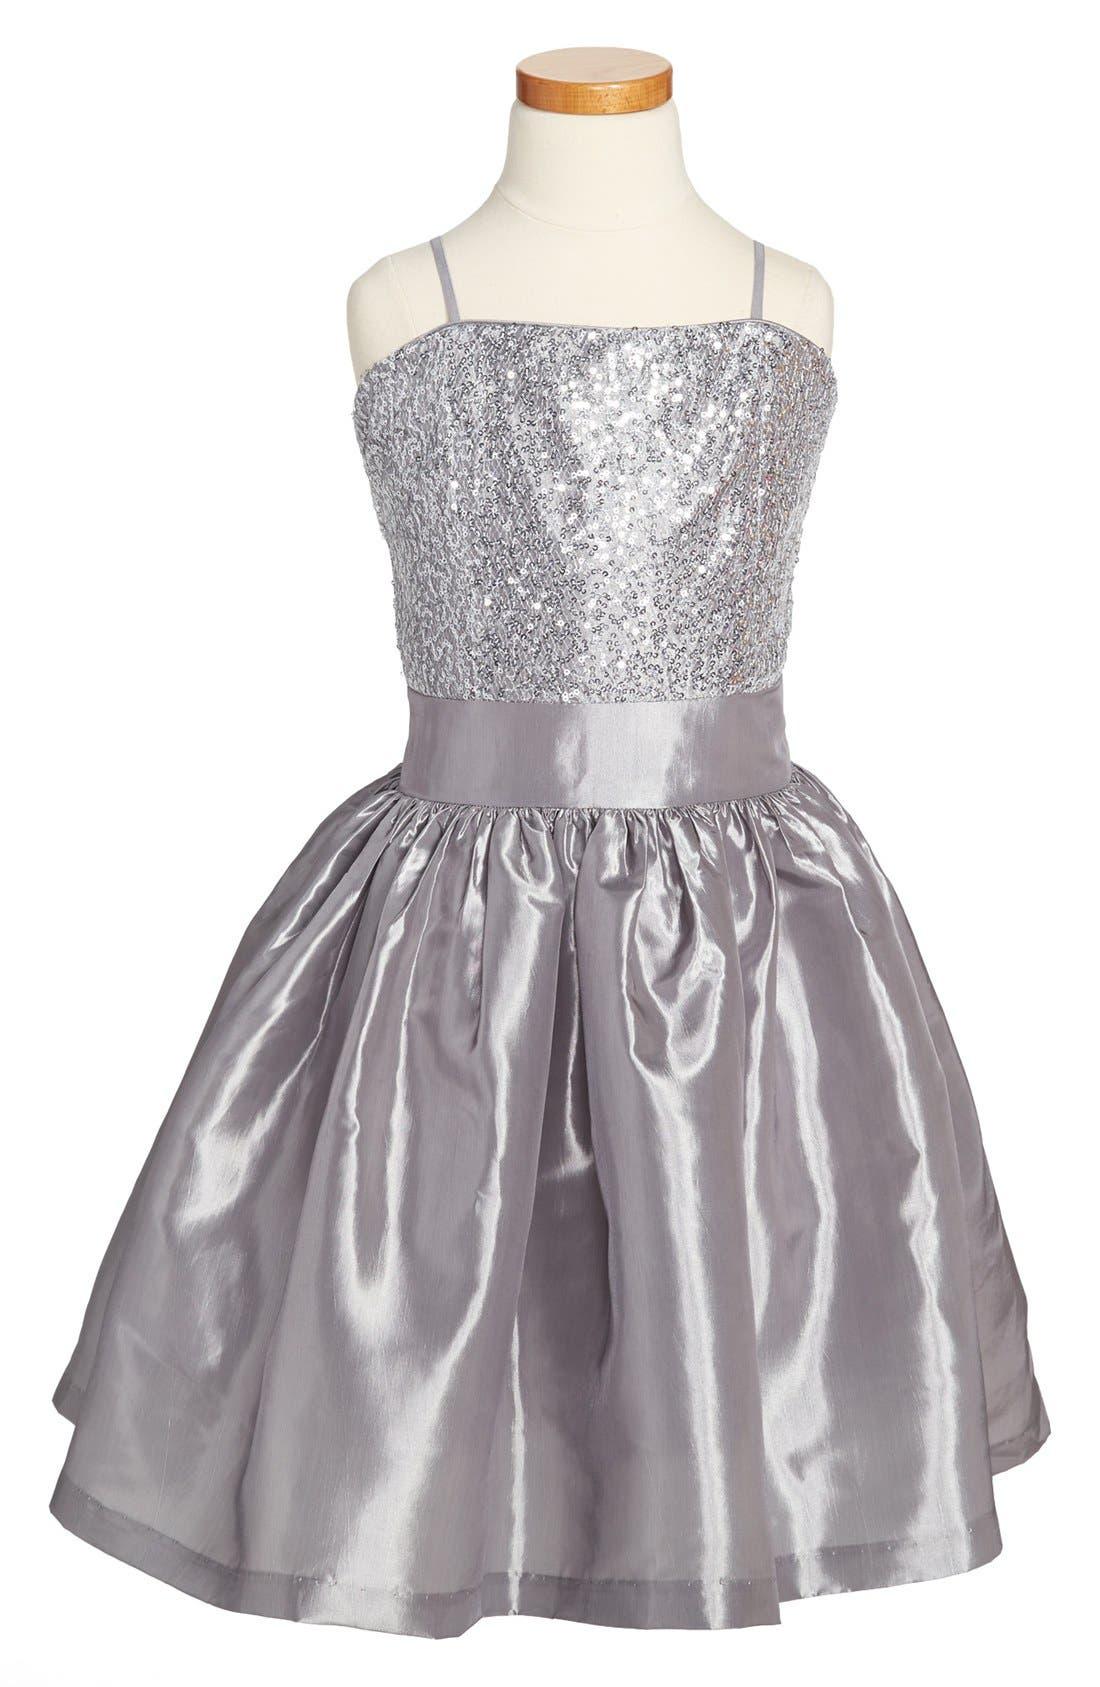 Alternate Image 1 Selected - Un Deux Trois Sequin Taffeta Dress (Big Girls)